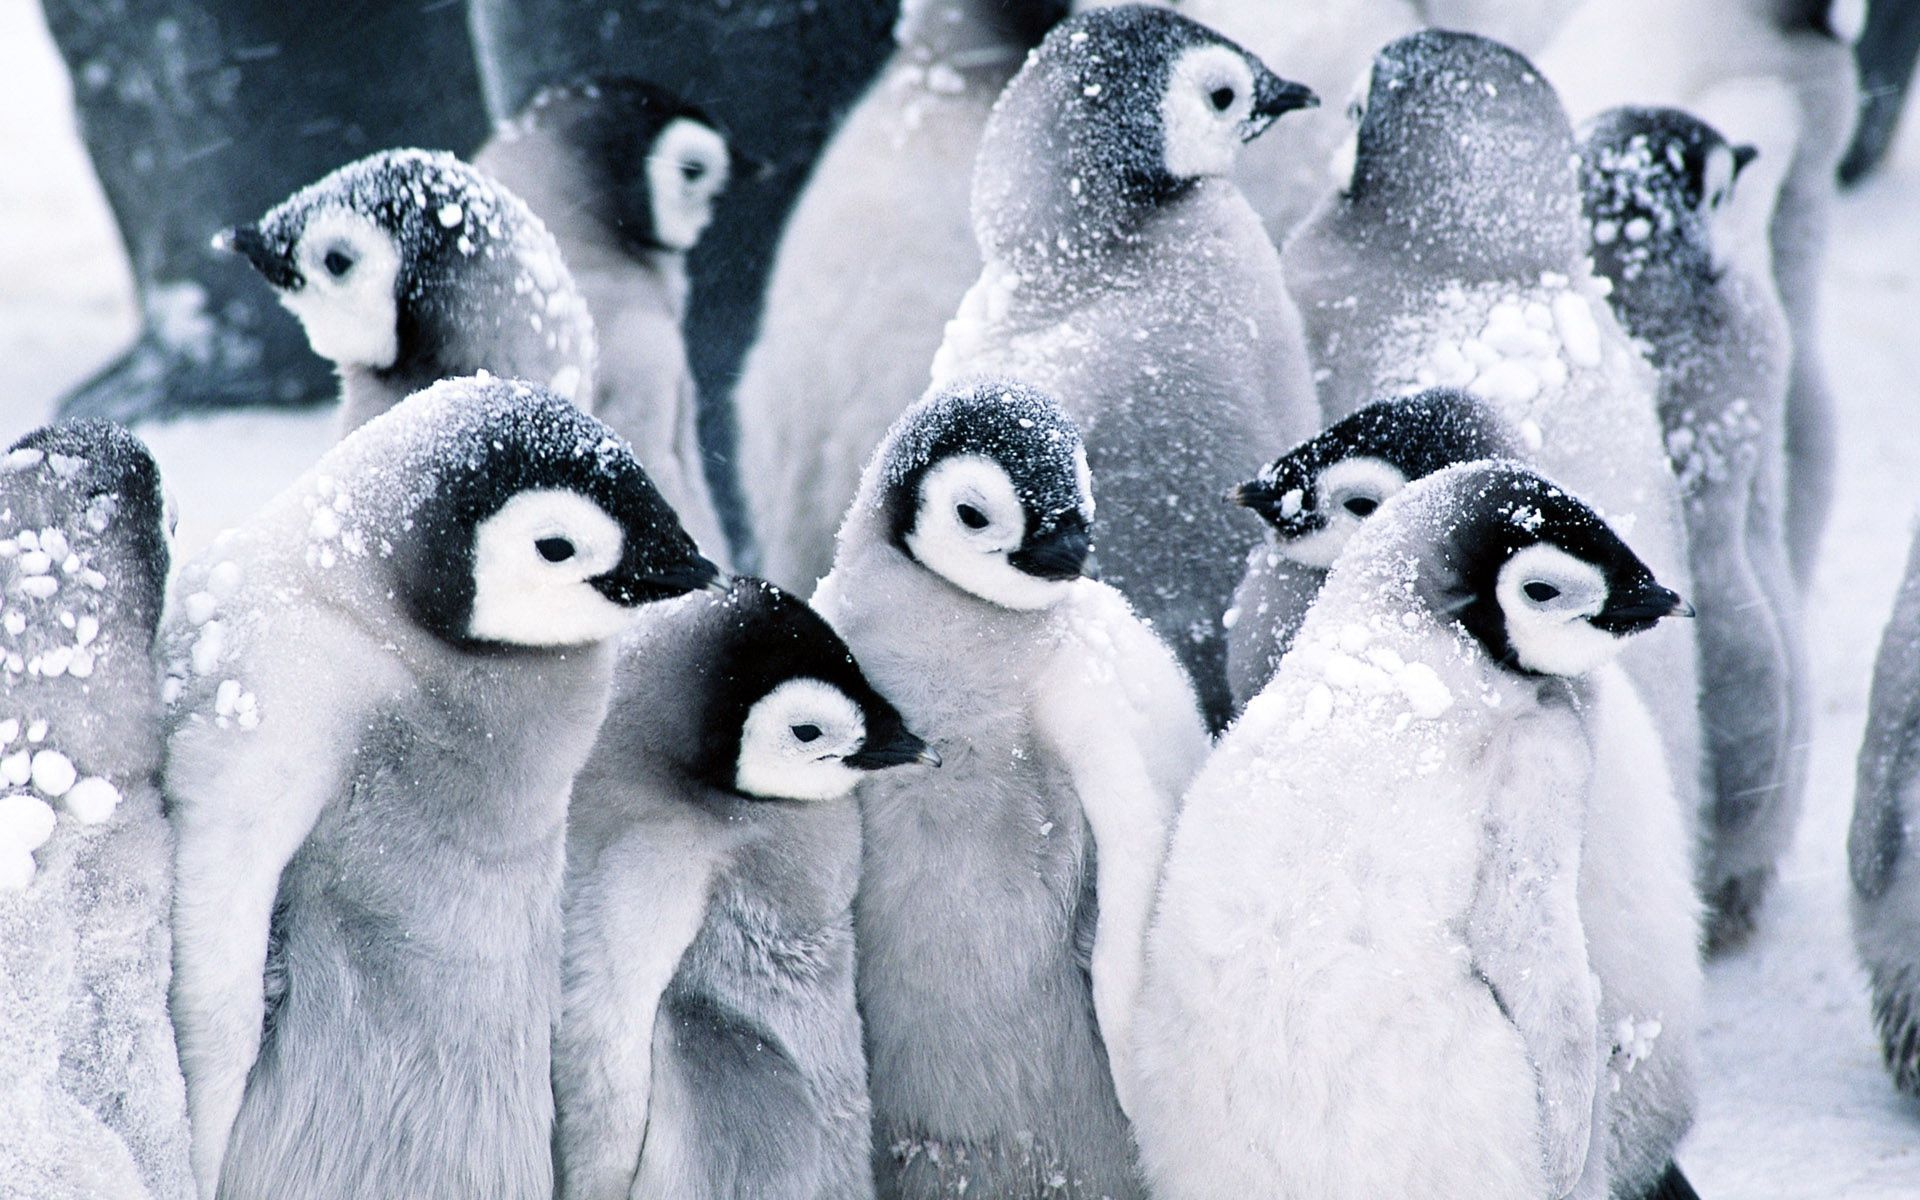 Cute Stitch Phone Wallpaper Penguin Hd Wallpapers Pixelstalk Net